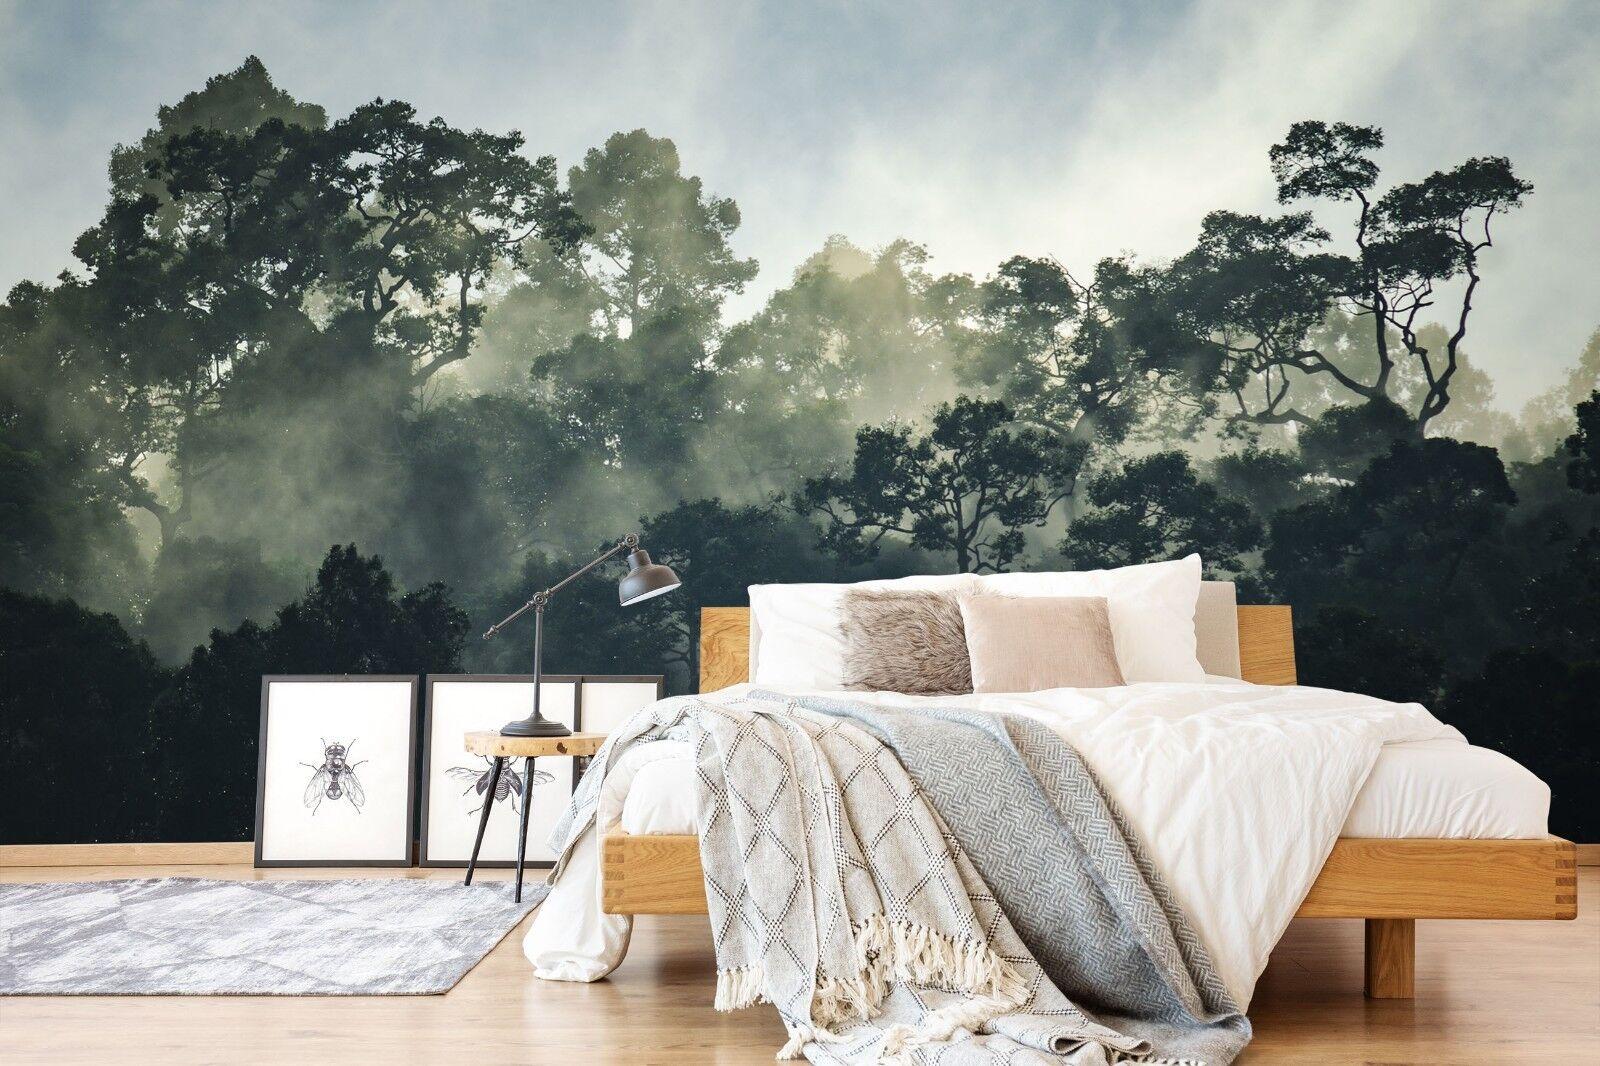 905 Leaf Tree Green 3D Wallpaper Summer CA Murals Indoor